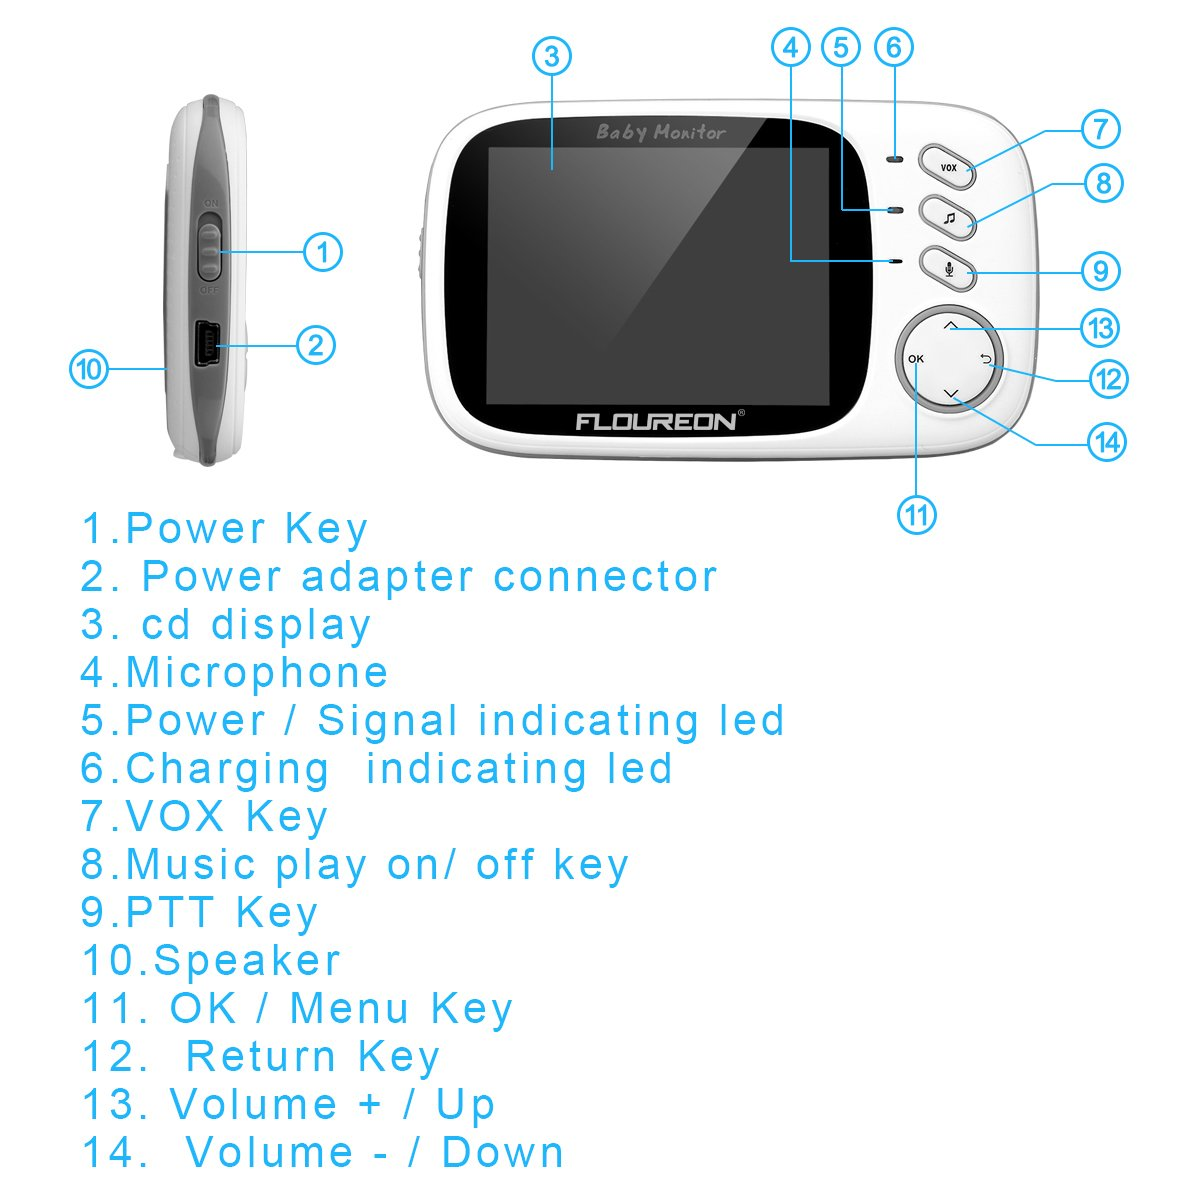 FLOUREON Wireless Video Baby Monitor 2.4 GHz 3.2\